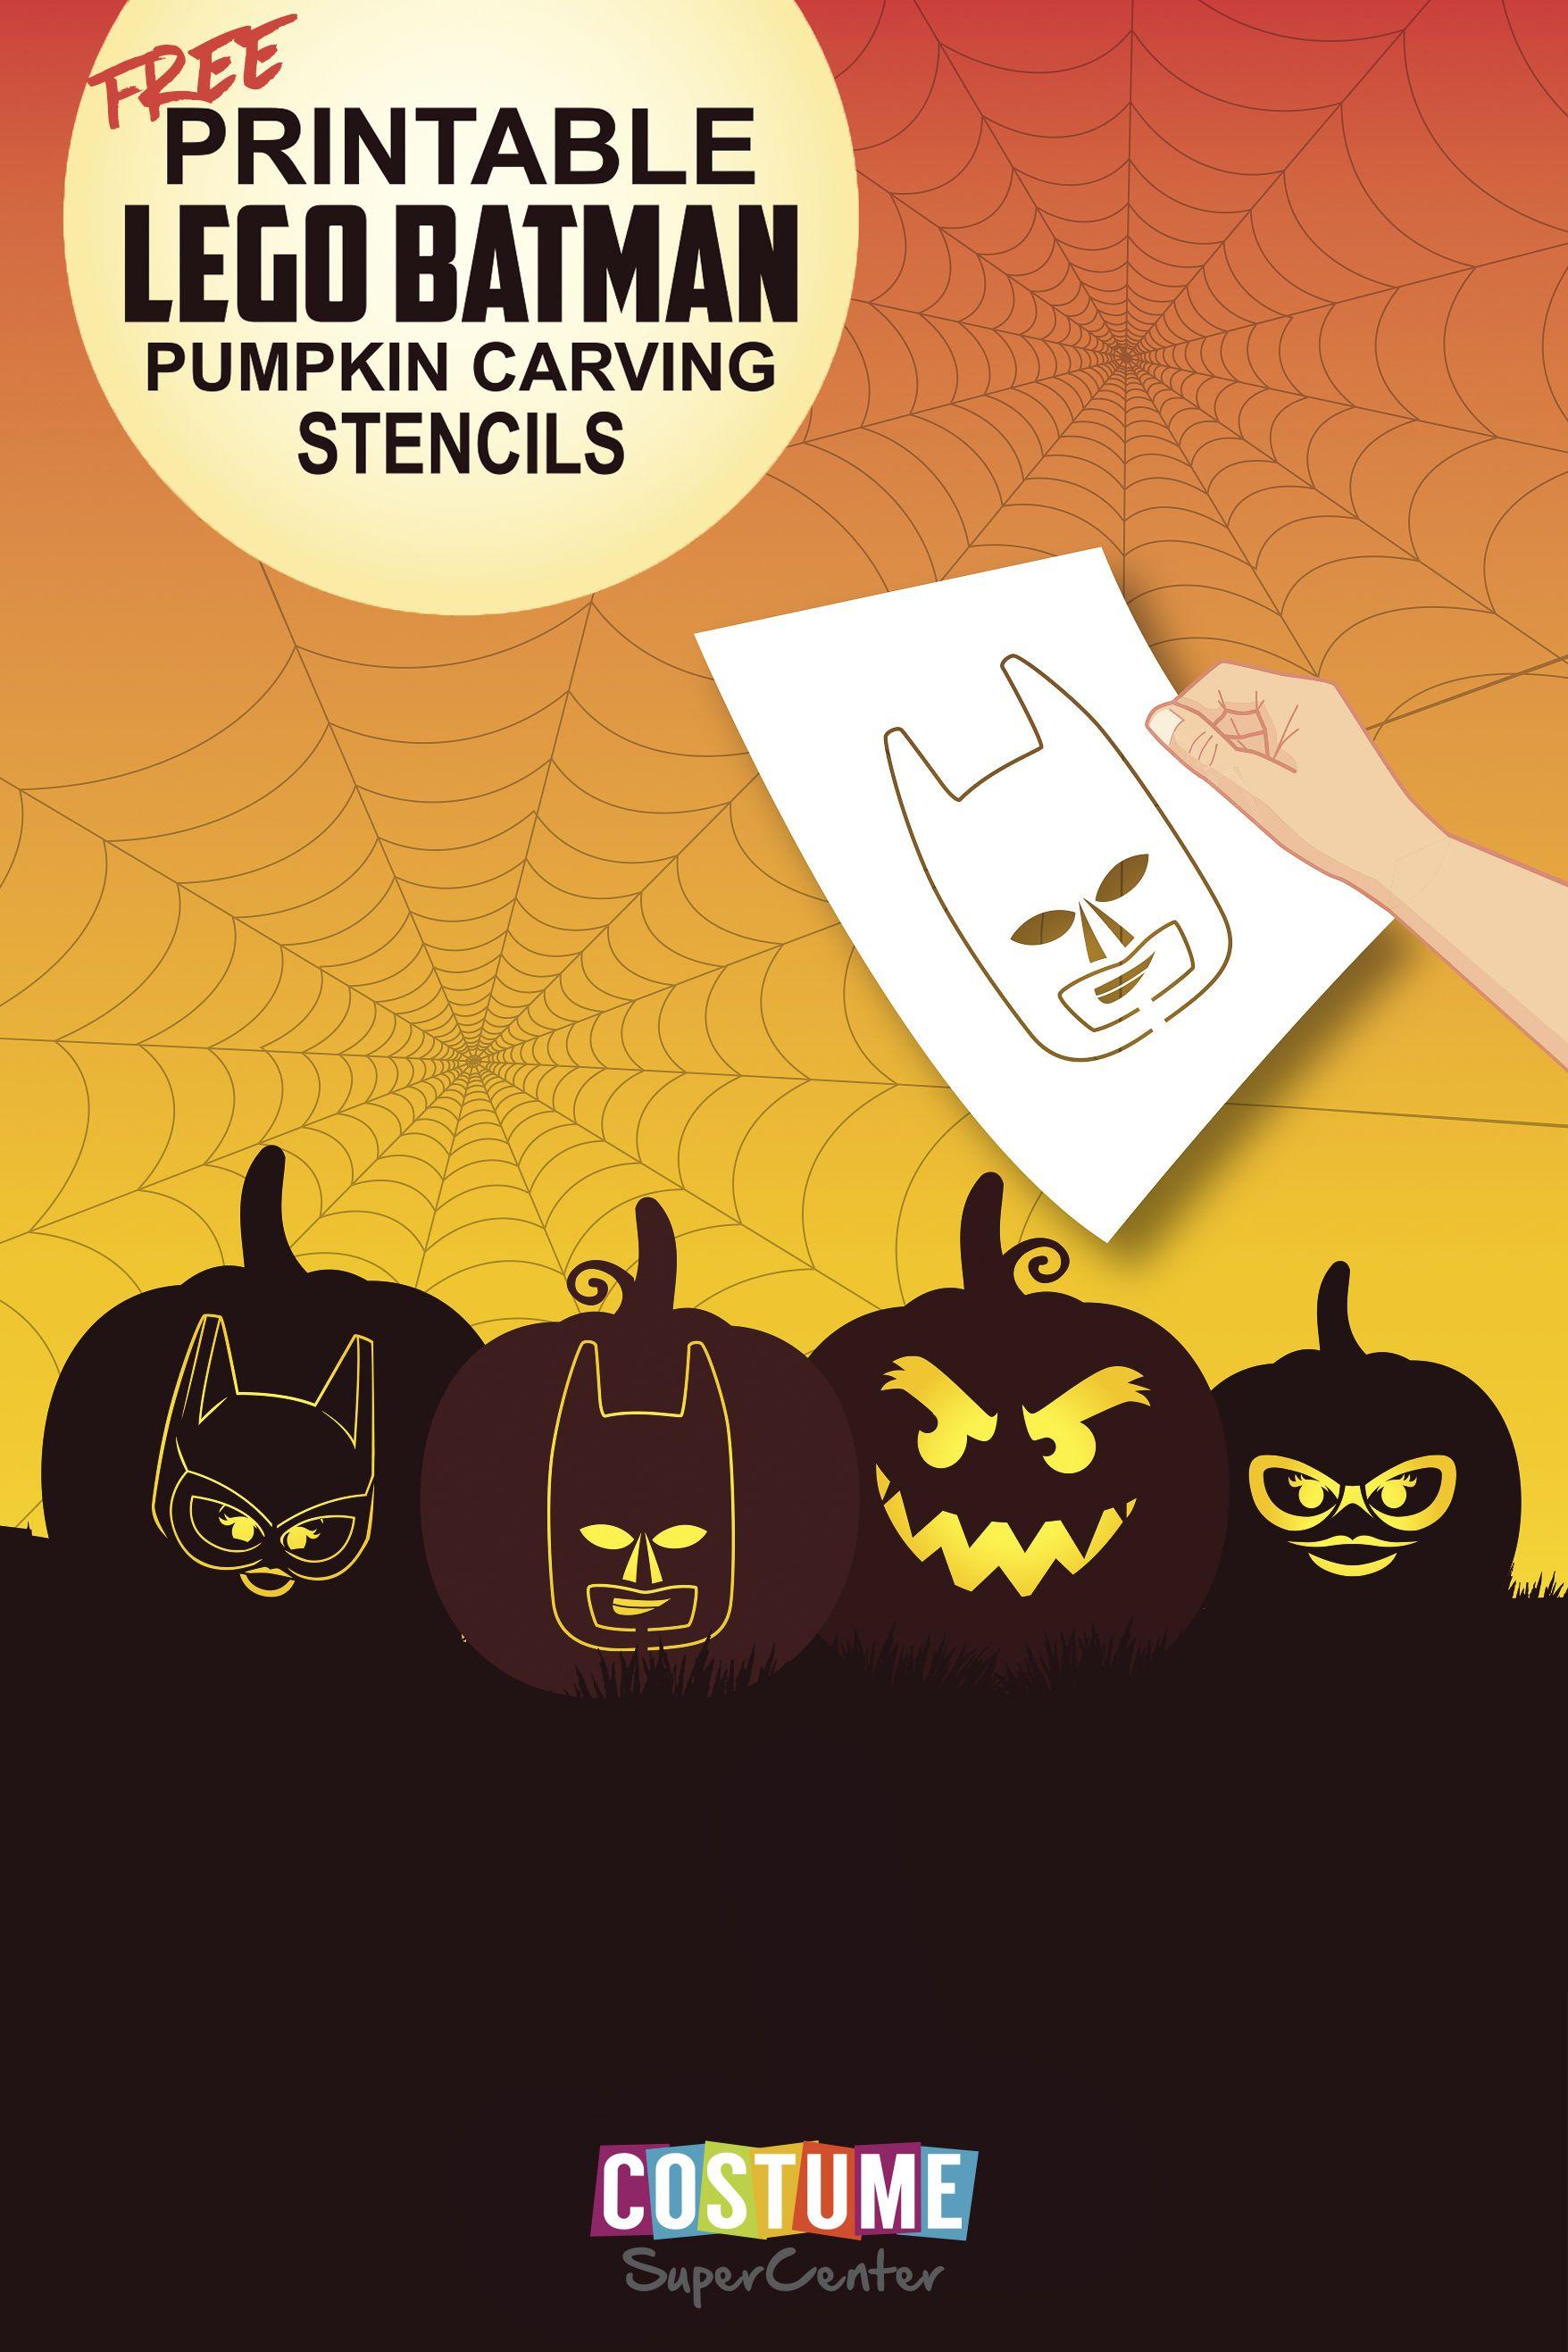 Lego Batman Pumpkin Carving Stencils Halloween Stencils Halloween Pumpkin Stencils Pumpkin Carvings Stencils